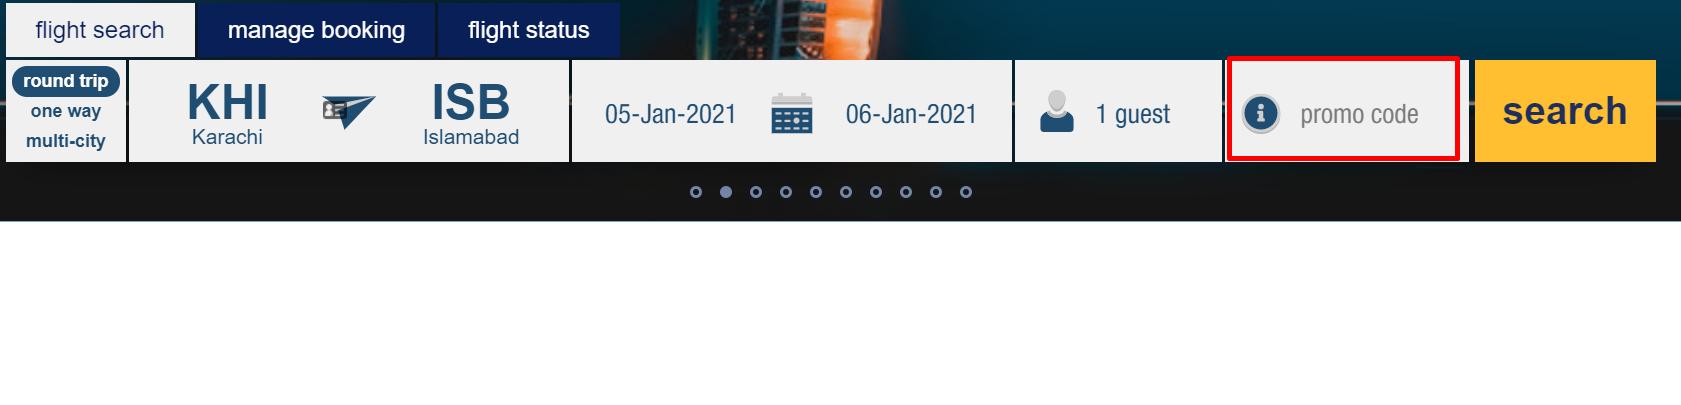 How do I use my Airblue promo code?